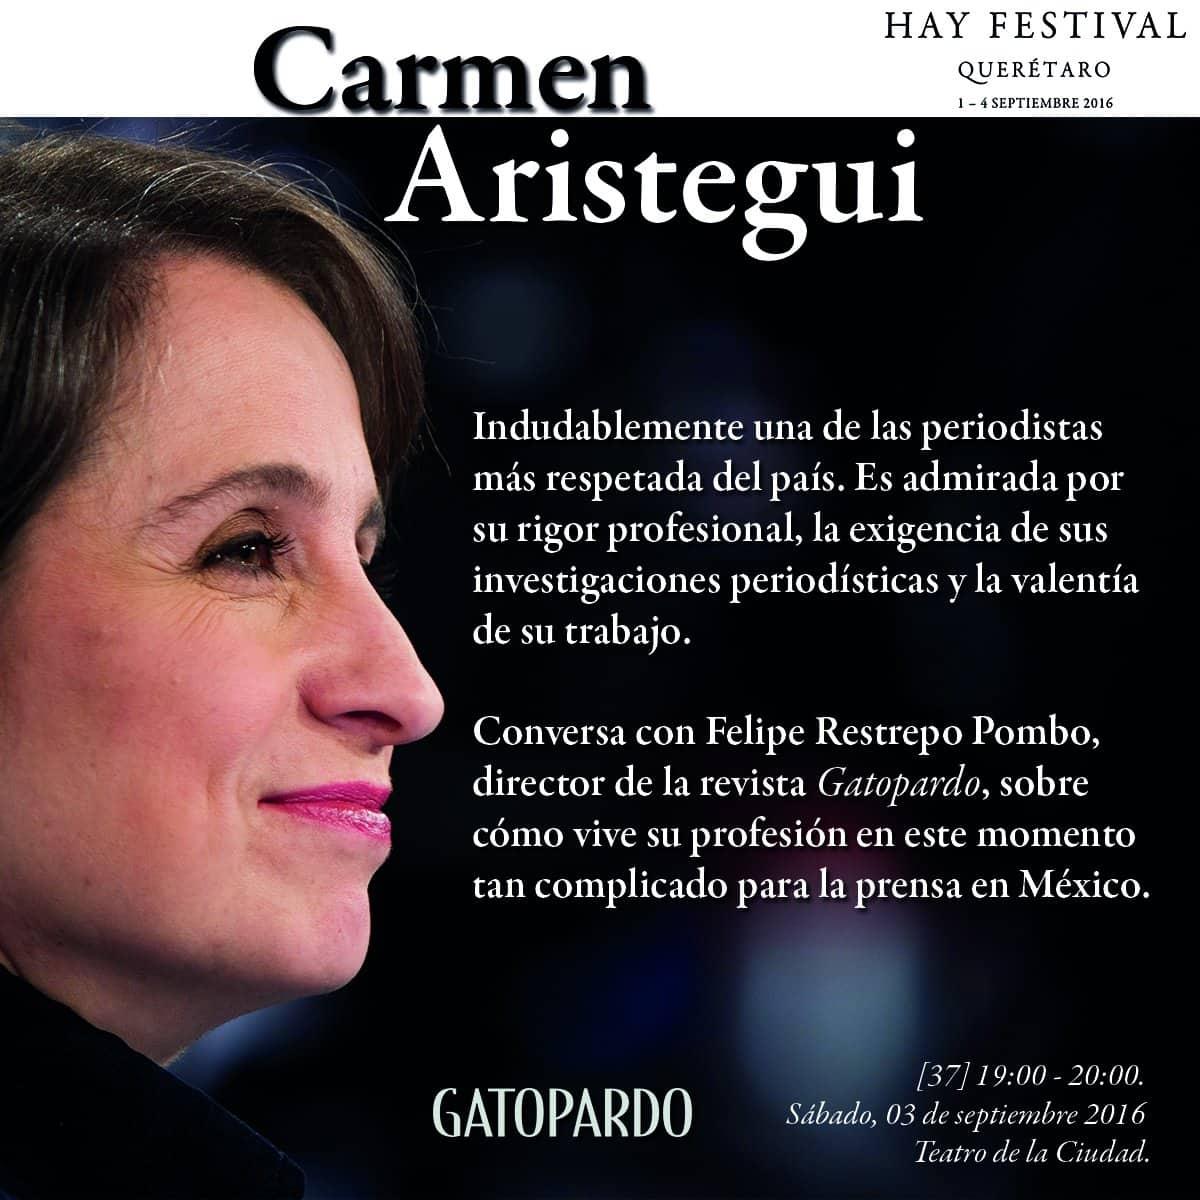 Carmen Aristegui Hay Festival